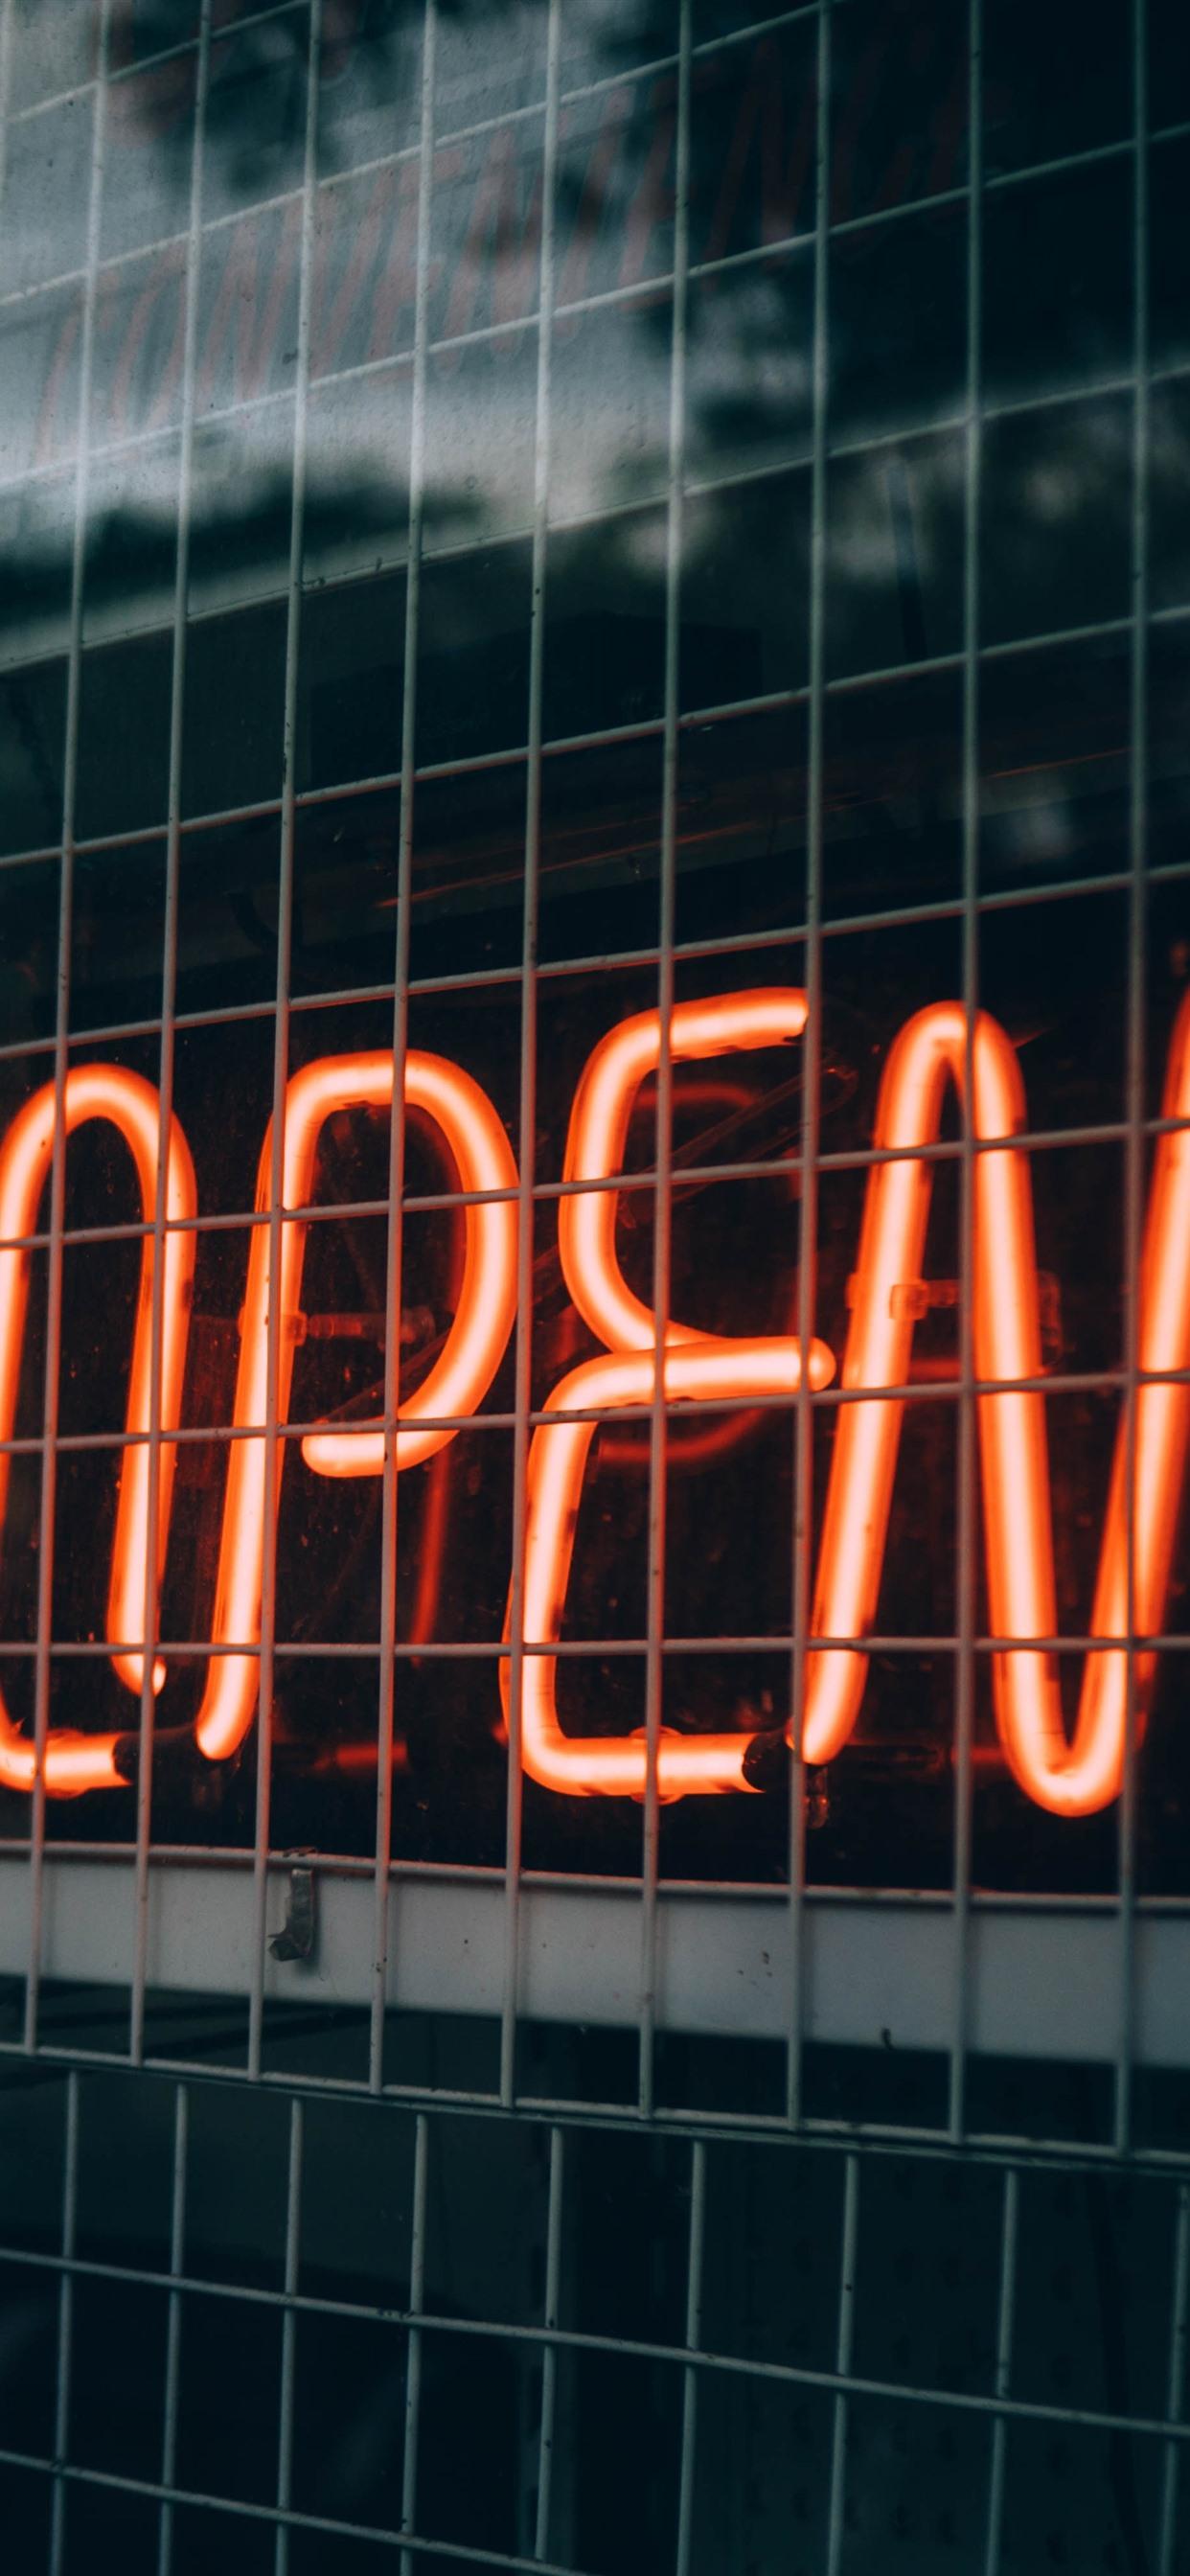 Wallpaper Open, neon lights 5120x2880 UHD 5K Picture, Image